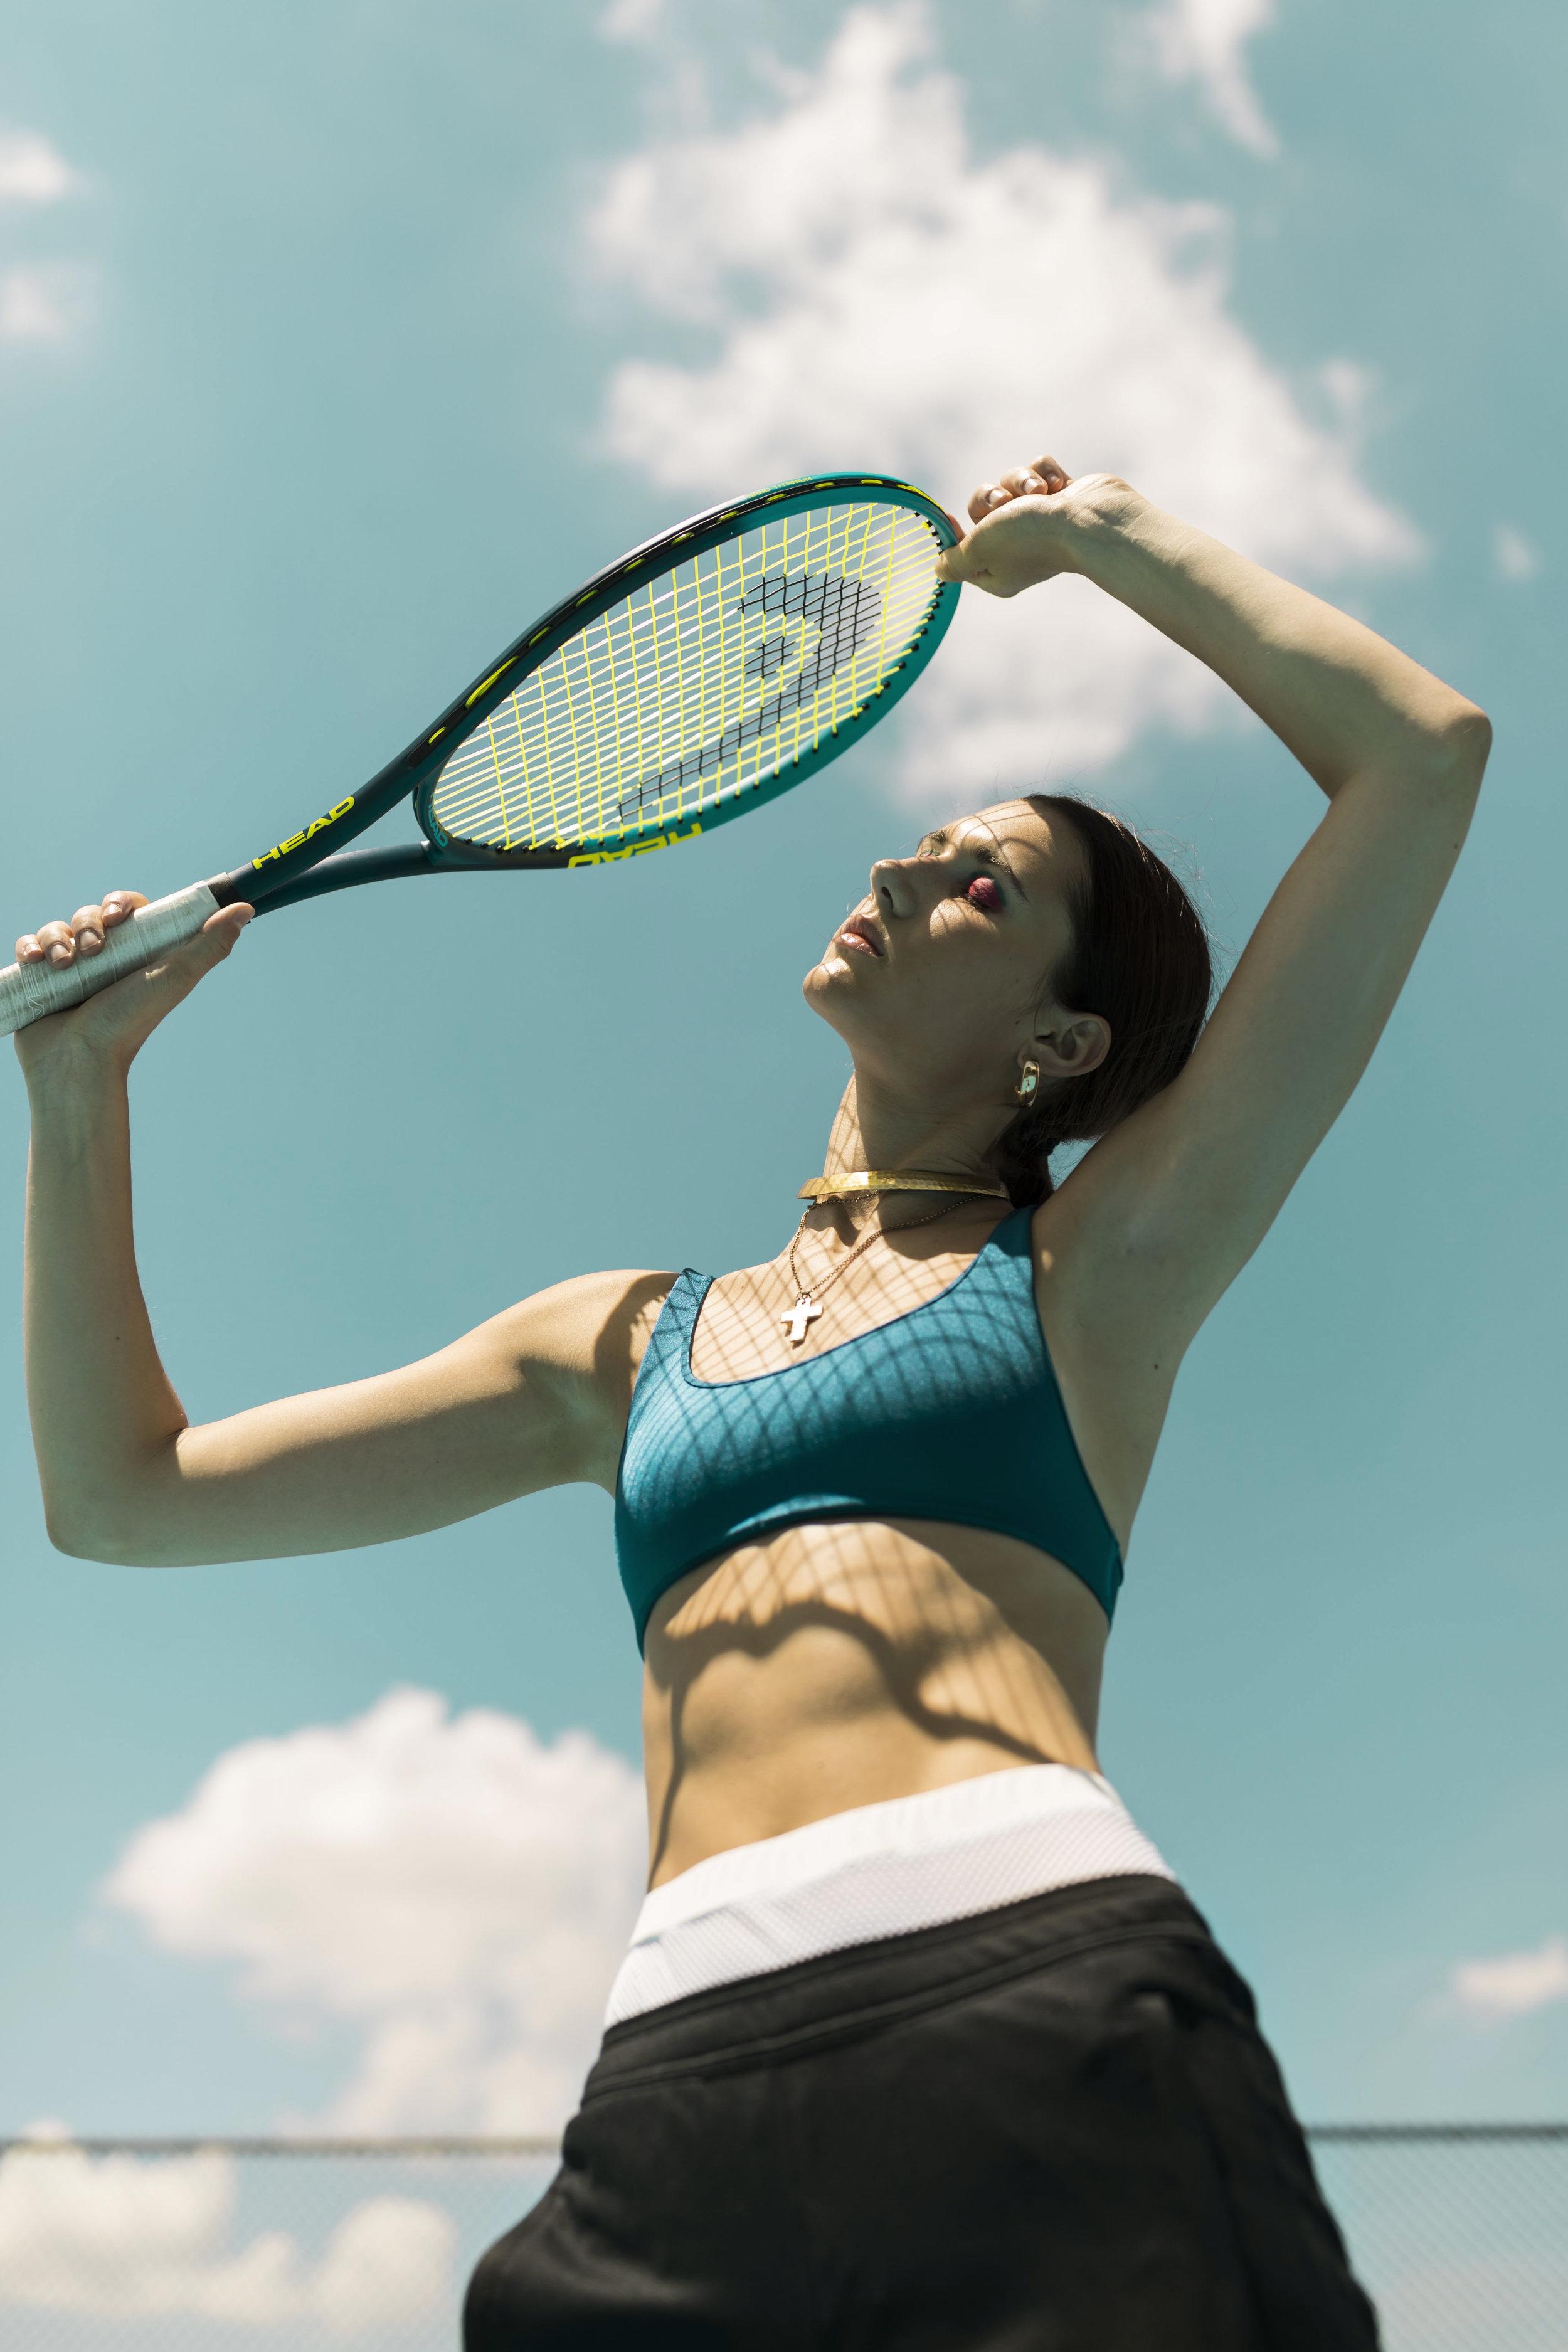 Retro Athleisure, Volant Magazine, Editorial, Ashley Gallerani Photography